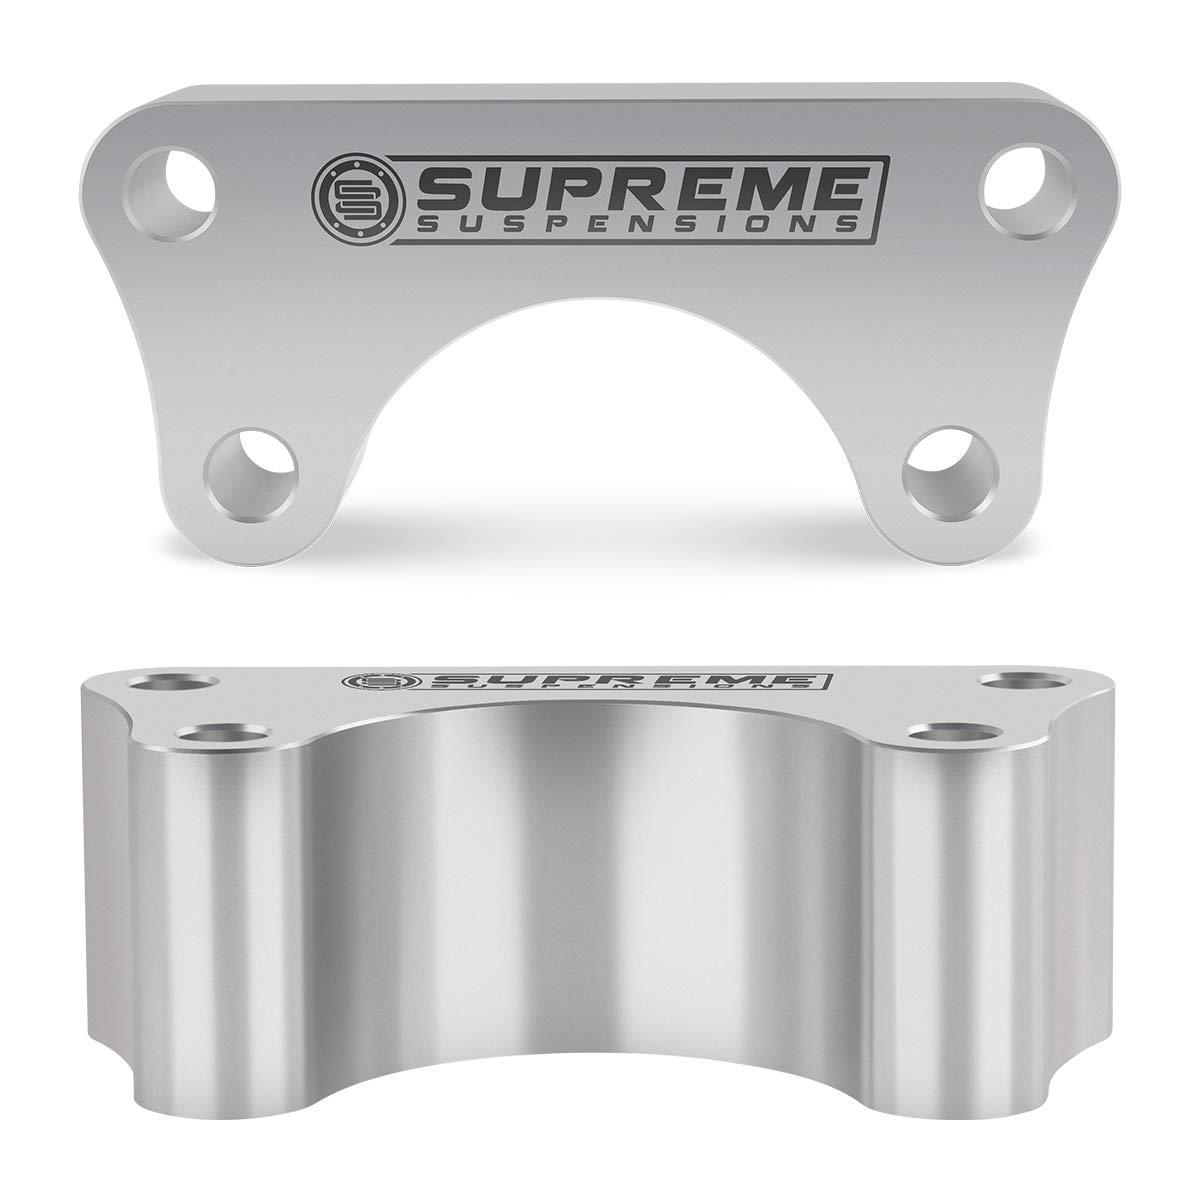 Supreme Suspensions Front Leveling Kit for Toyota IFS Pickup 3 Front Billet Spacers Suspension Leveling Lift Kit 2WD 4x2 Black